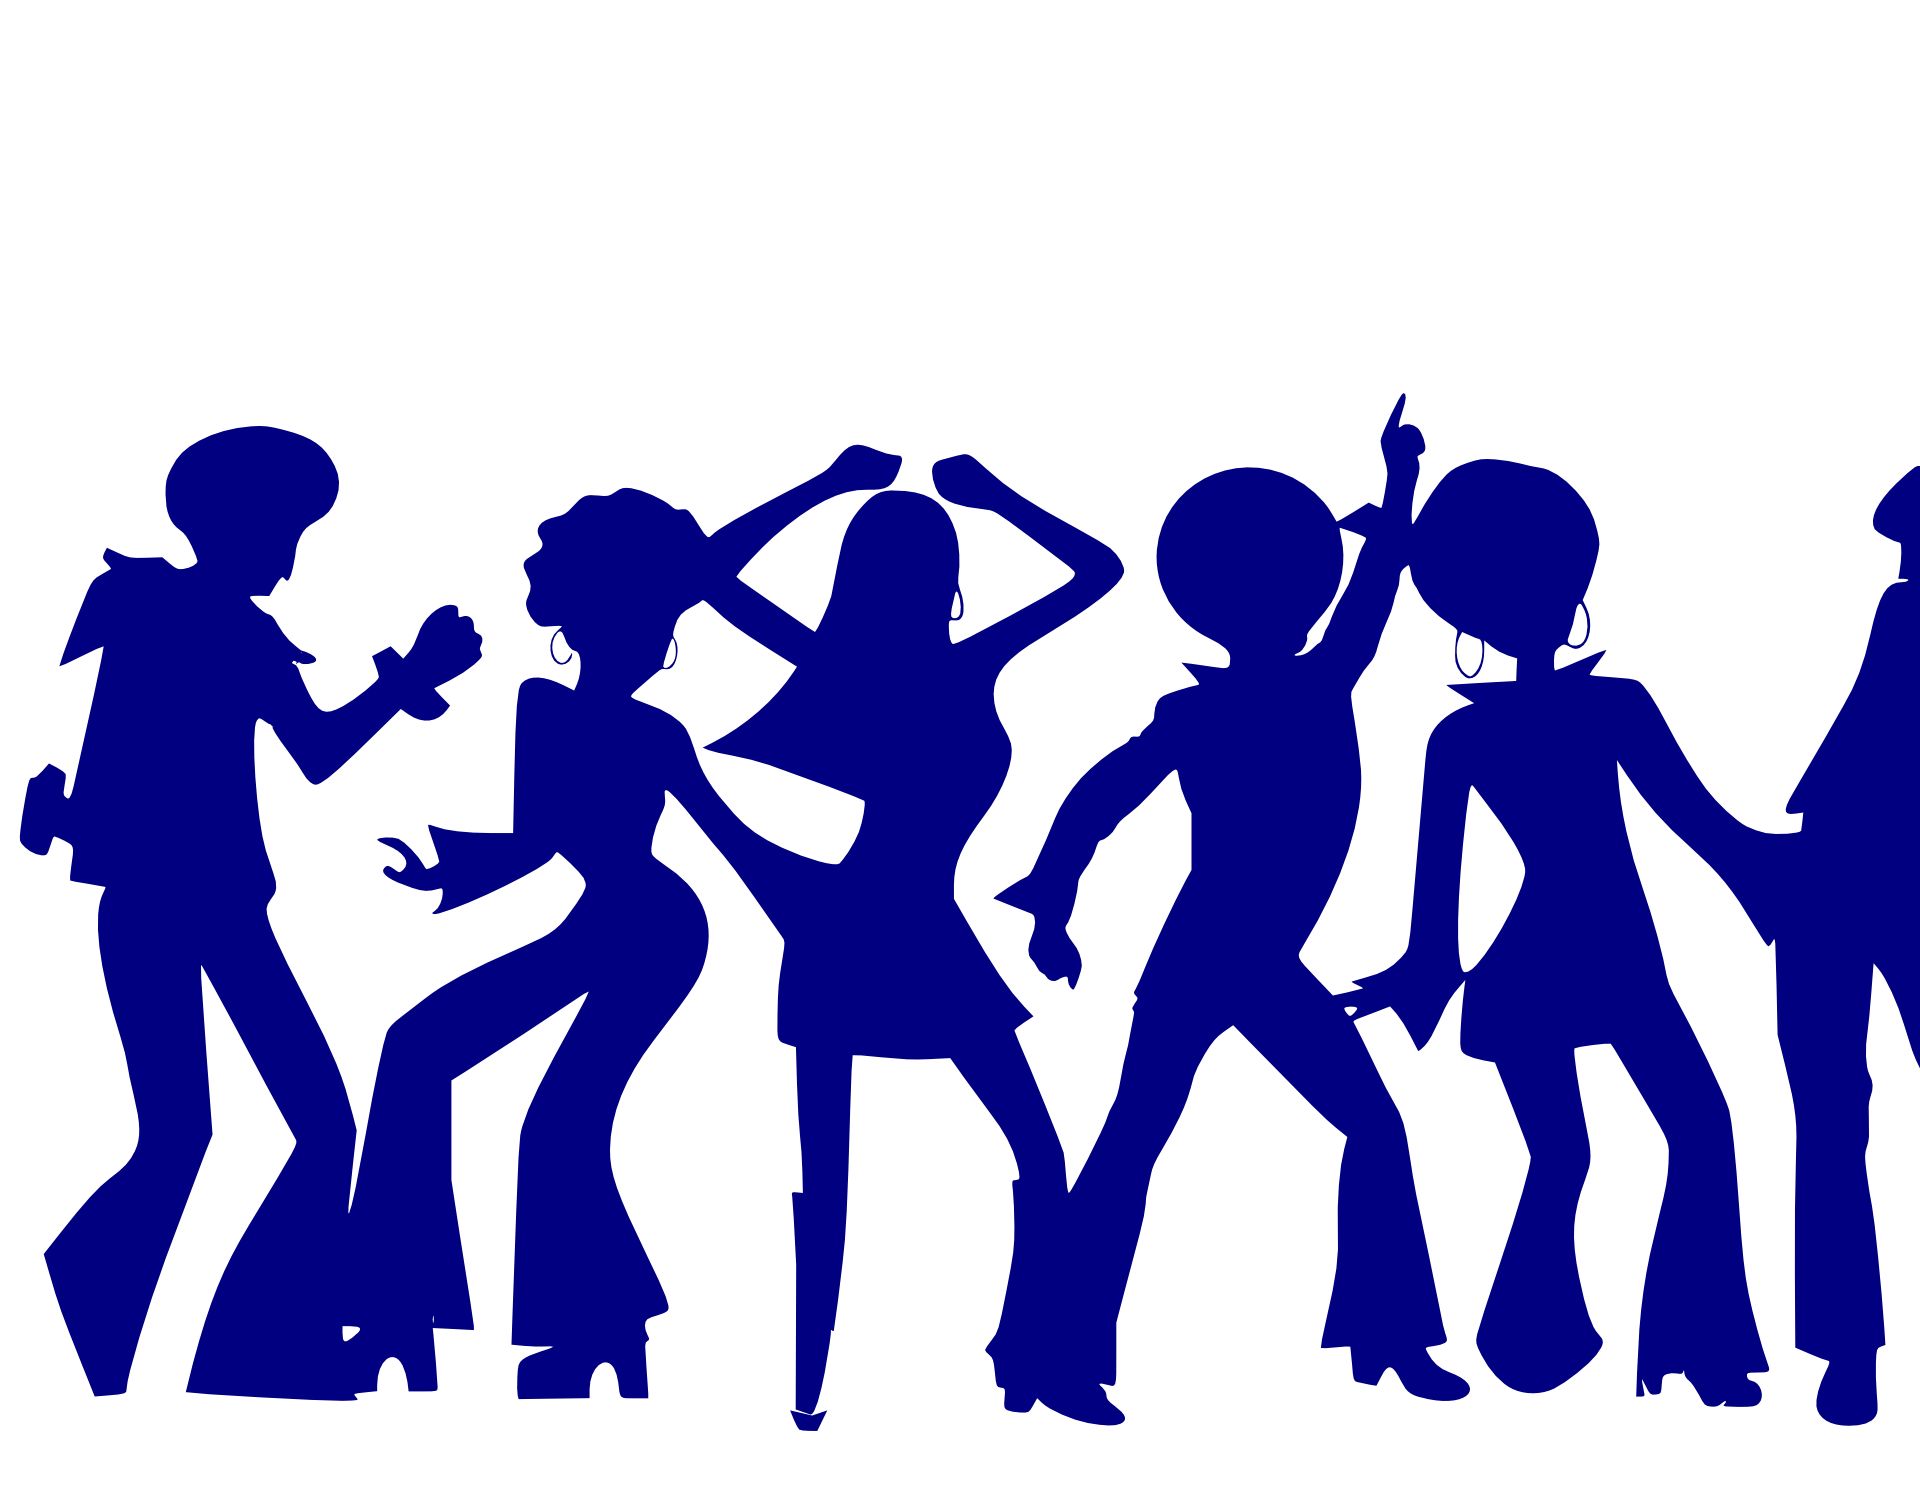 1920x1492 Drawing Of People Dancing